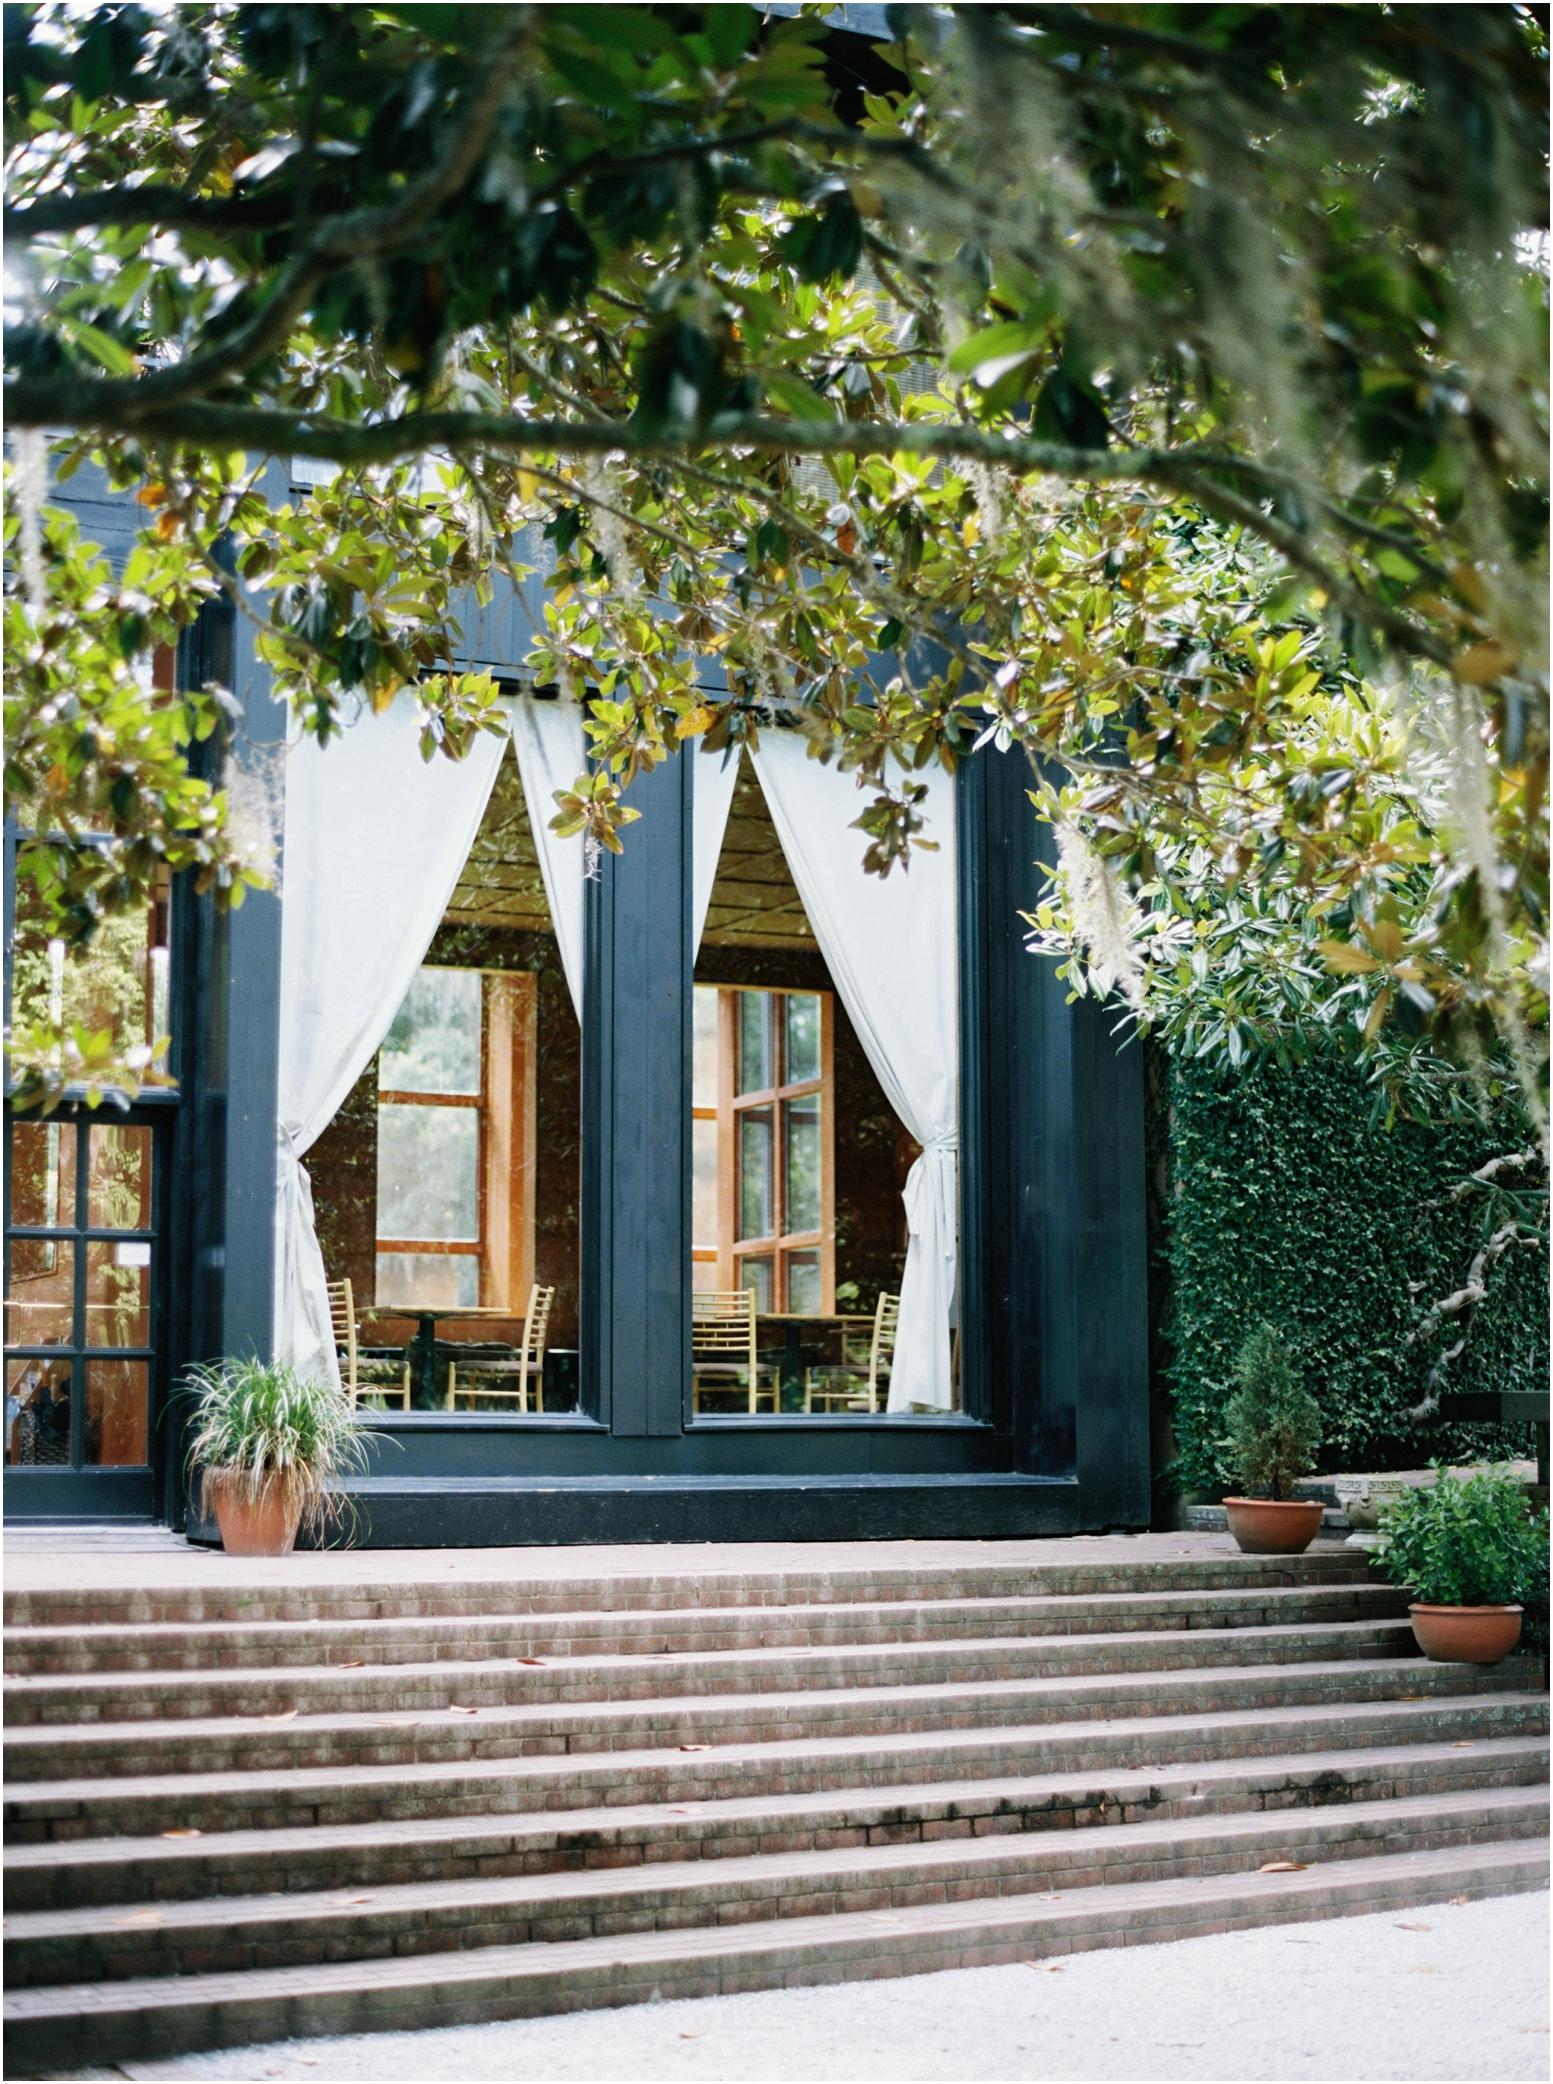 Middleton place wedding inspiration in charleston jophoto for Middleton home